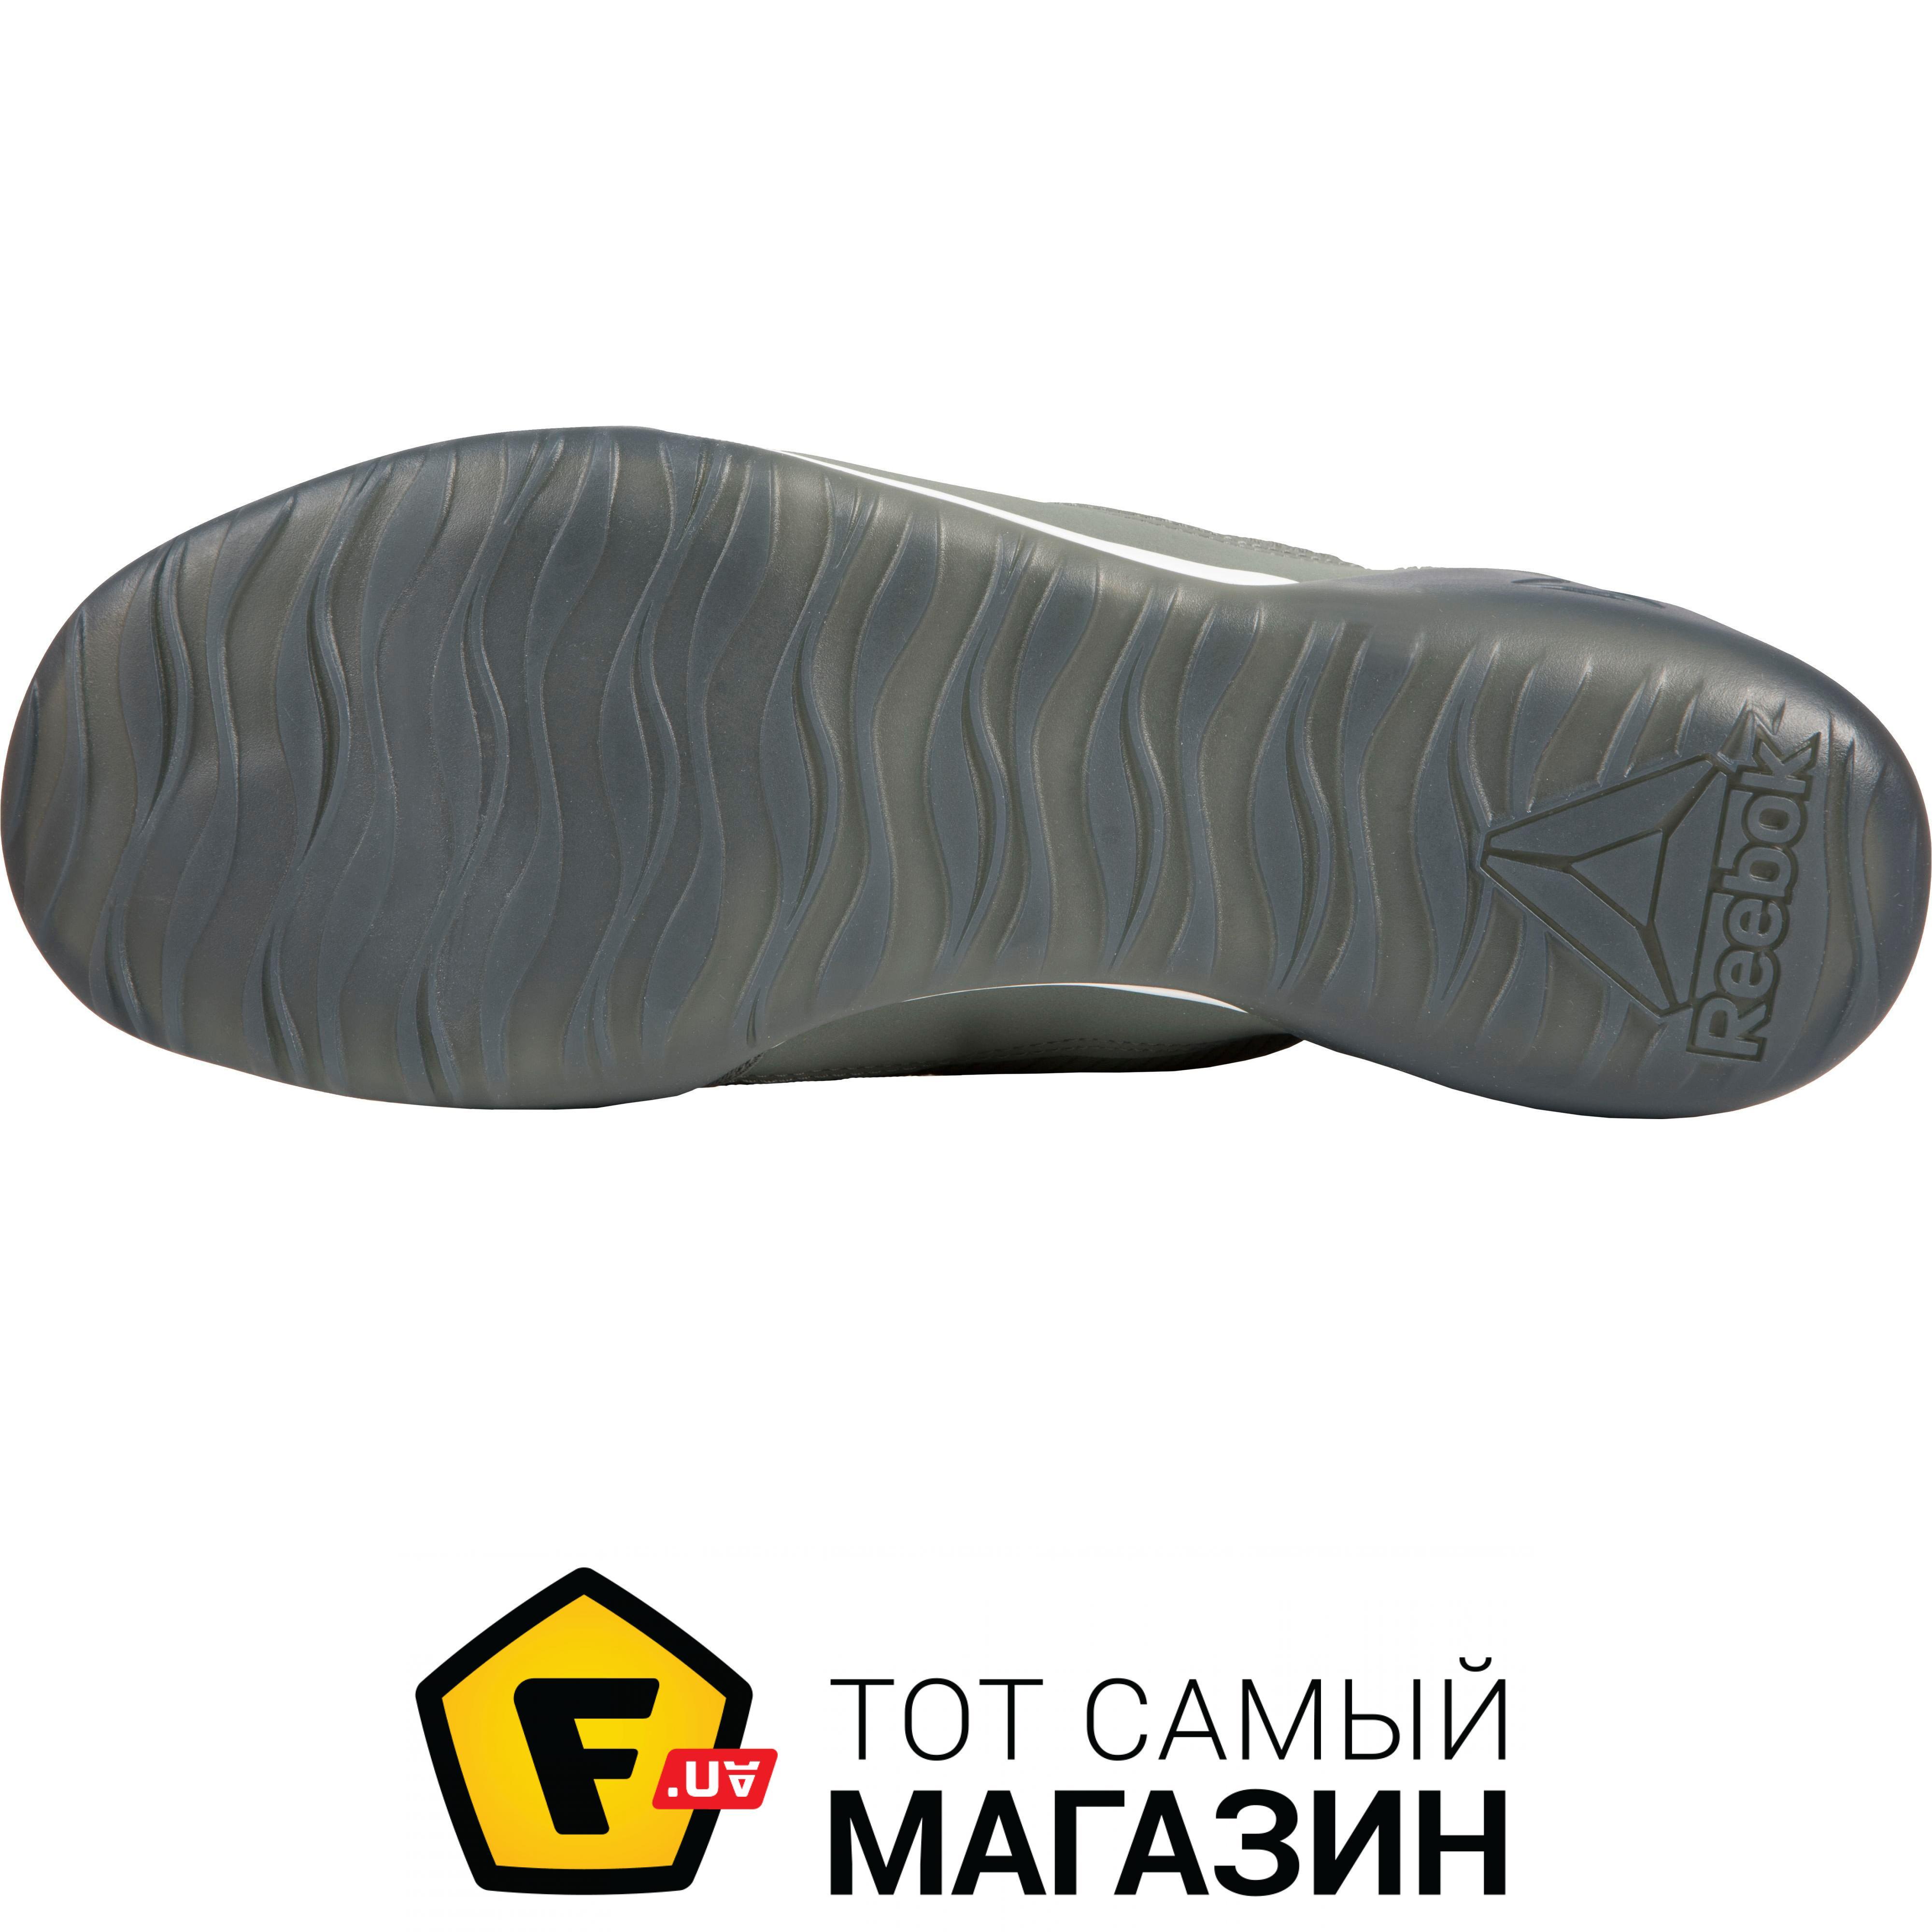 0690a3819e9c0c Reebok Combat Noble Mid Boxers 43, серый (REBD2) Назначение: для бокса (